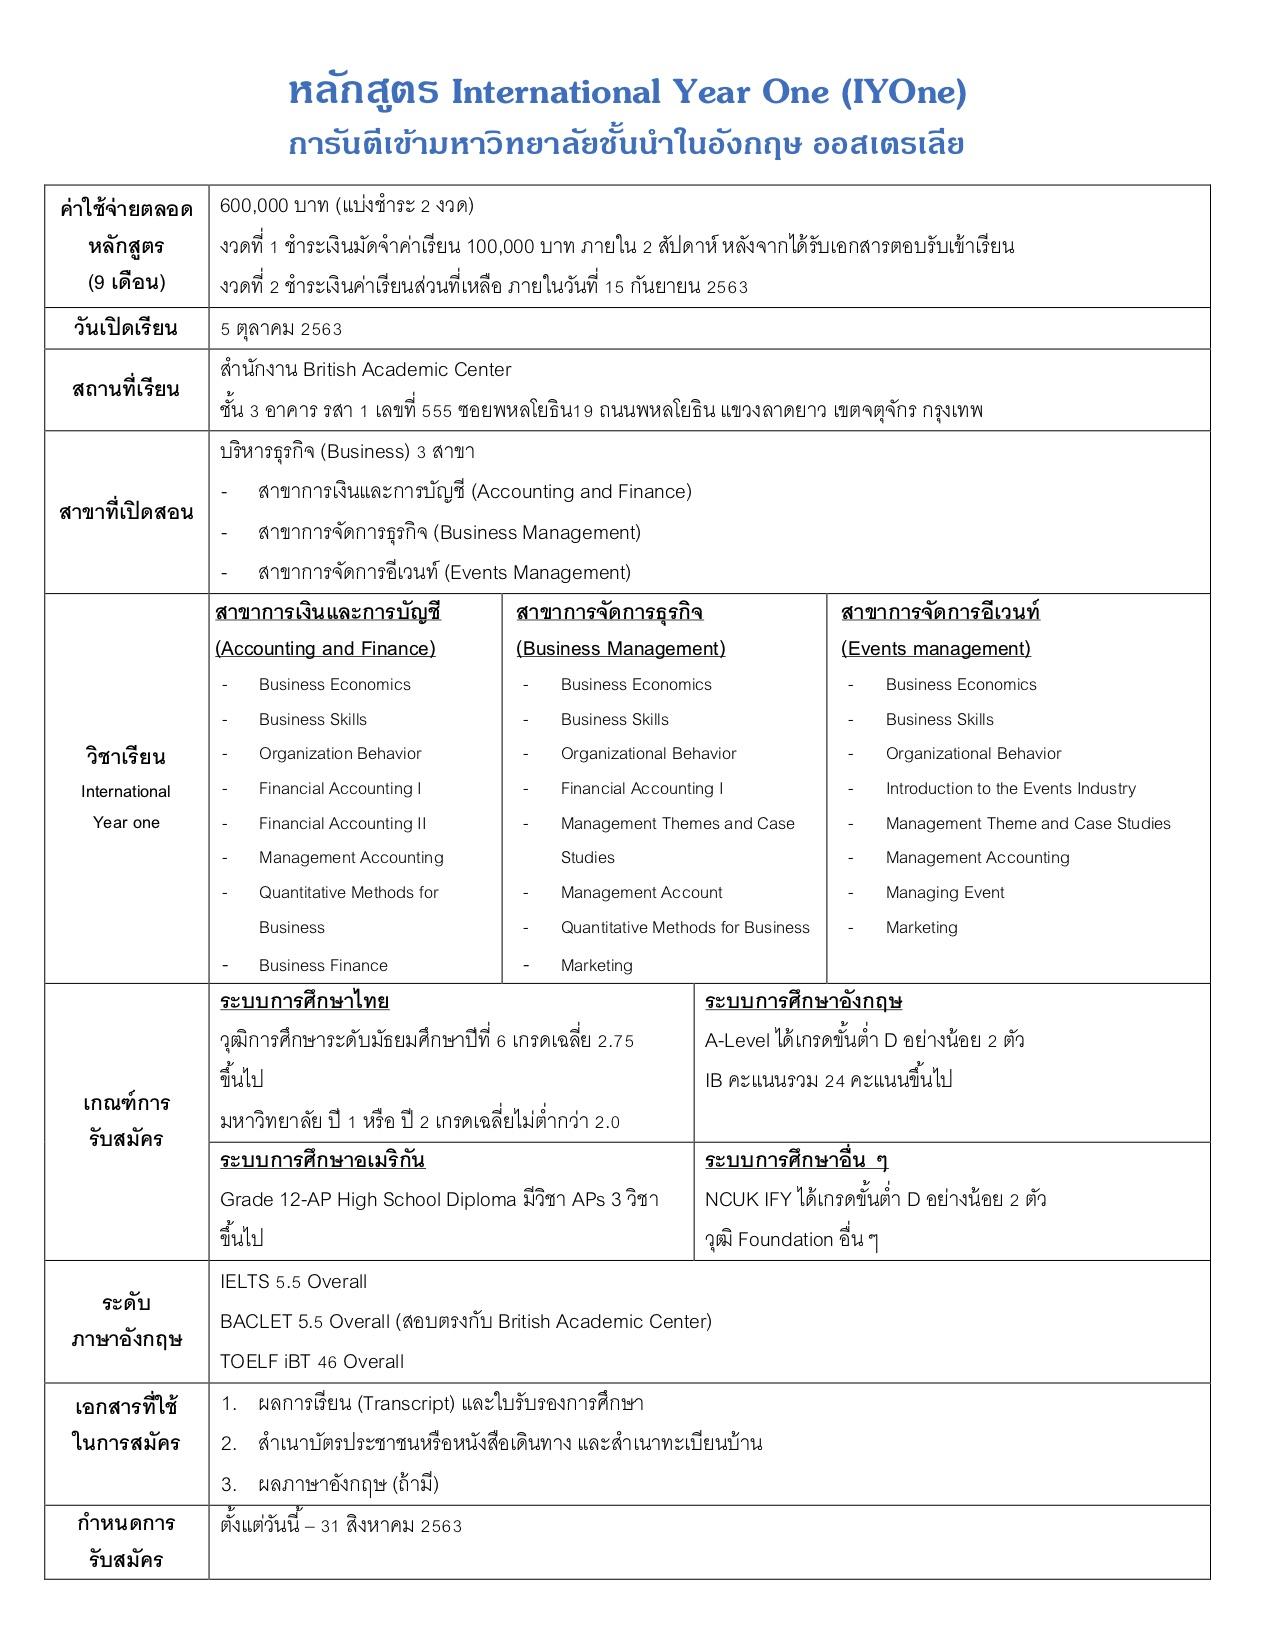 IFY Information-2